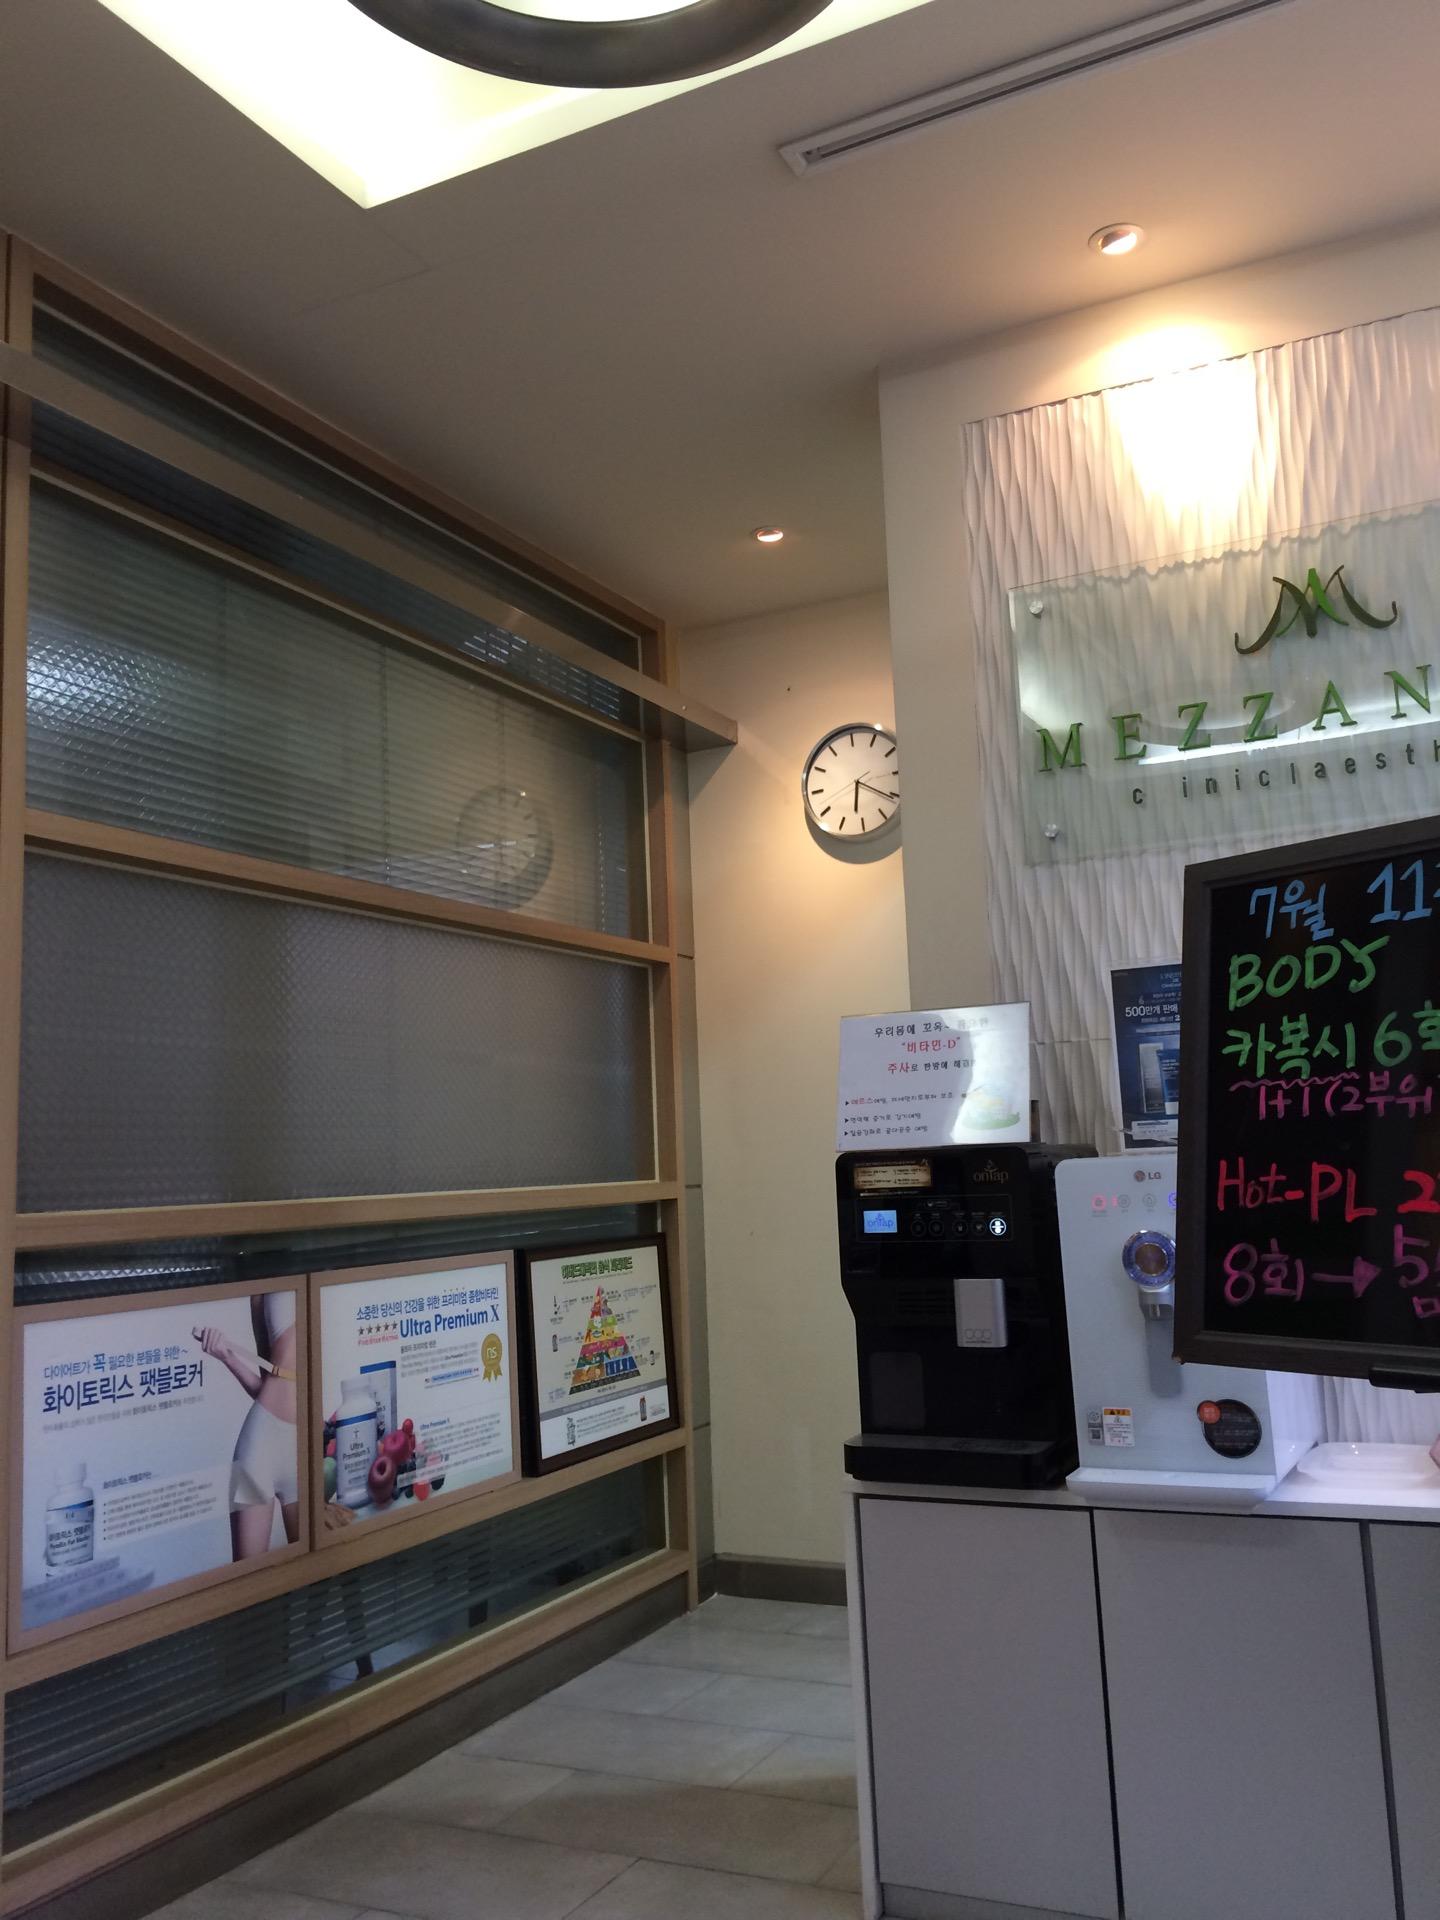 Mezzanine Clinic | Séoul GangNam-Gu CheongDam-1Dong 63-12 1/2 Apple Bldg (사 | +82 2-547-9711